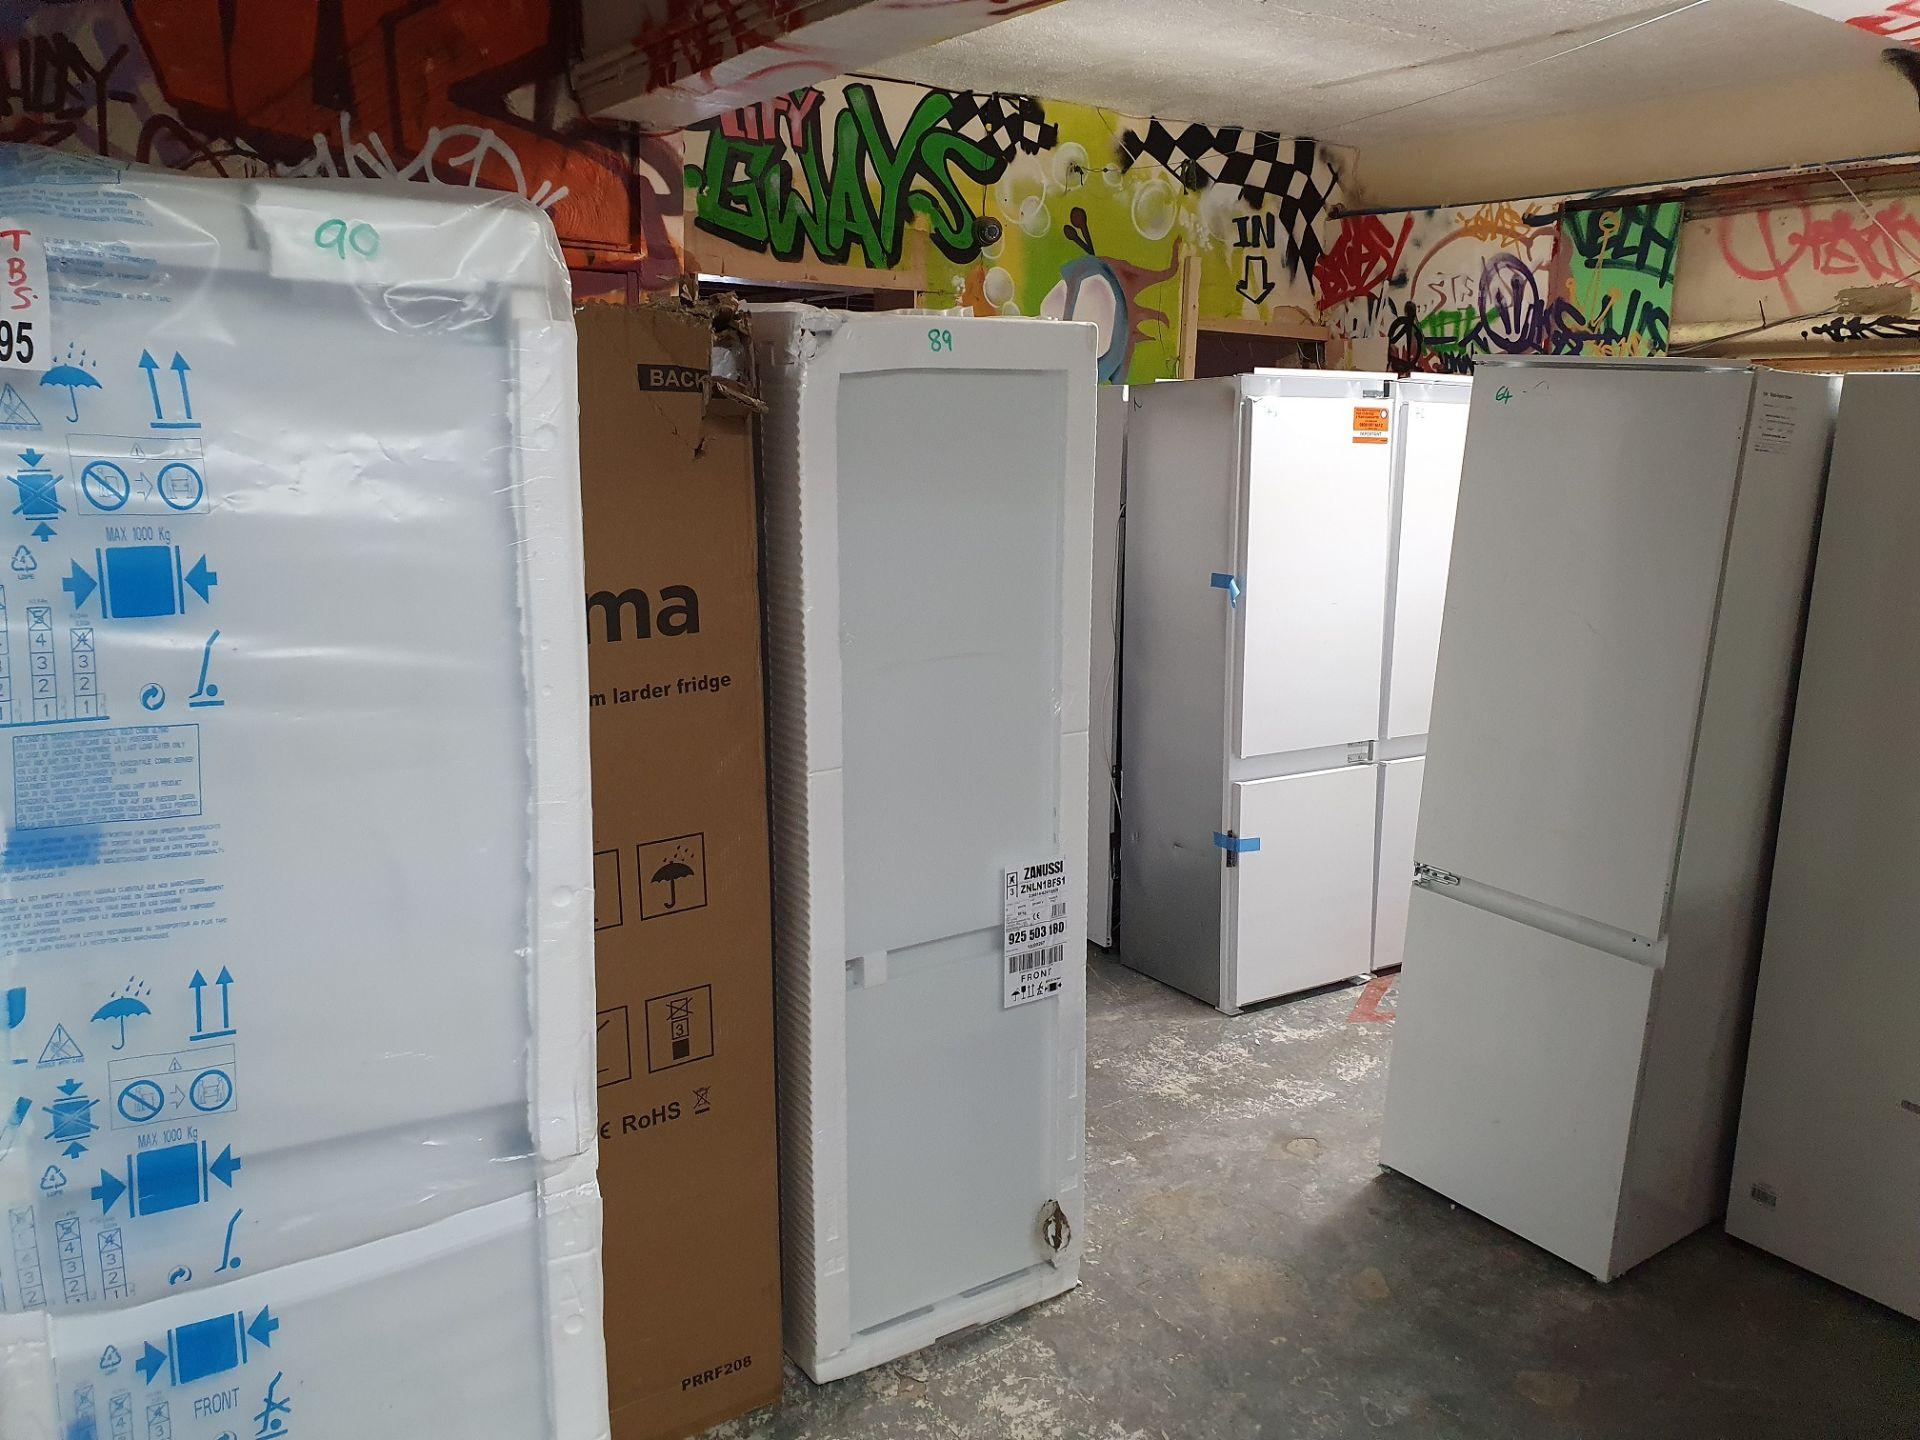 NEW/GRADED AND PACKAGED Zanussi ZBB28441SV Integrated 70/30 Fridge Freezer (Slight external damage) - Image 7 of 14